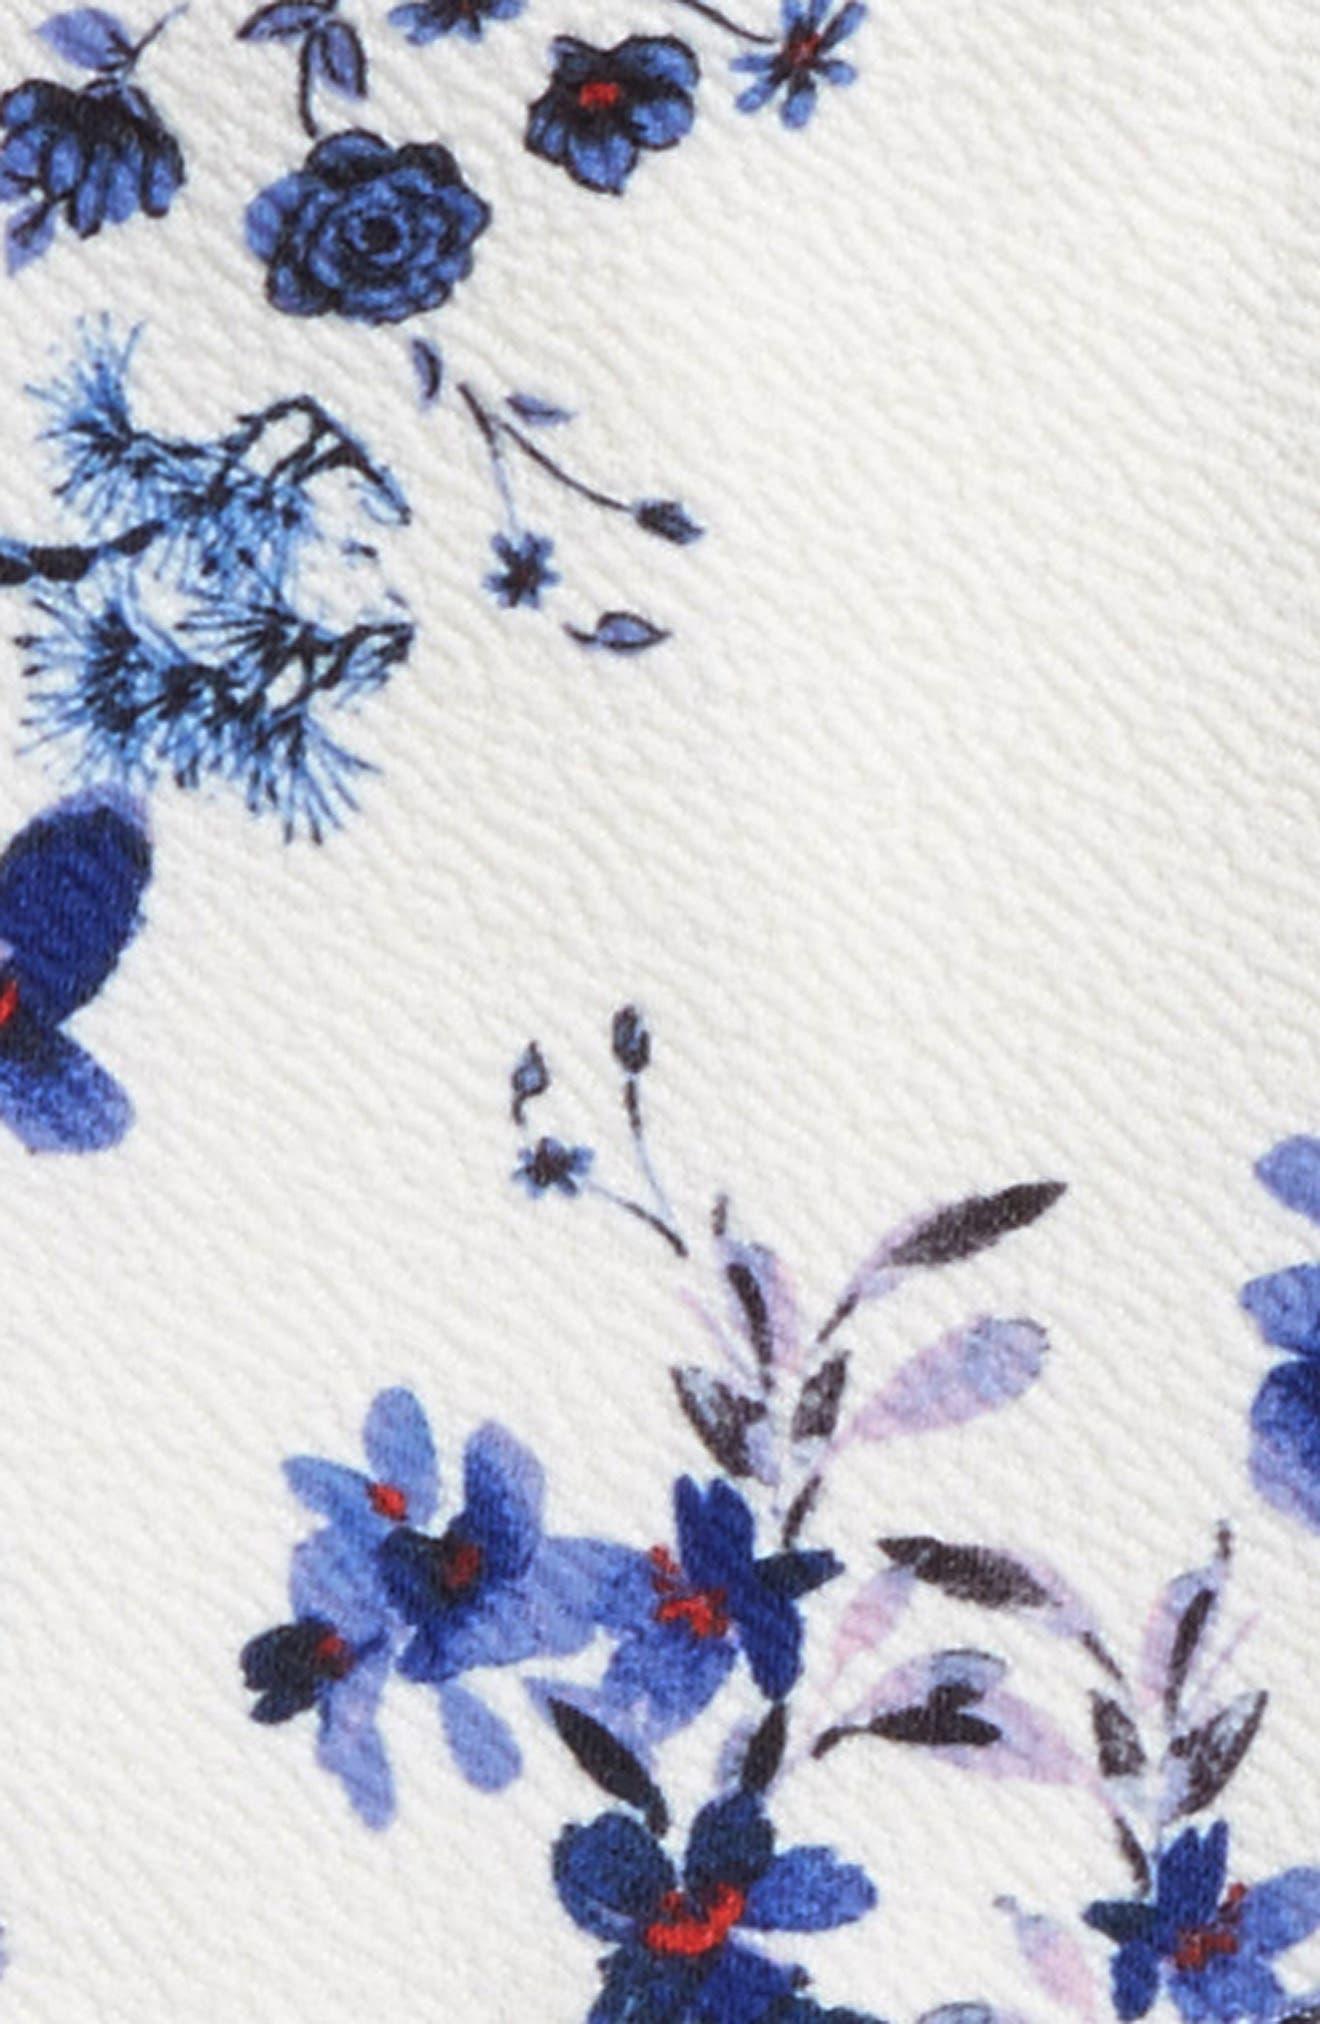 Floral Print Skater Dress,                             Alternate thumbnail 3, color,                             111